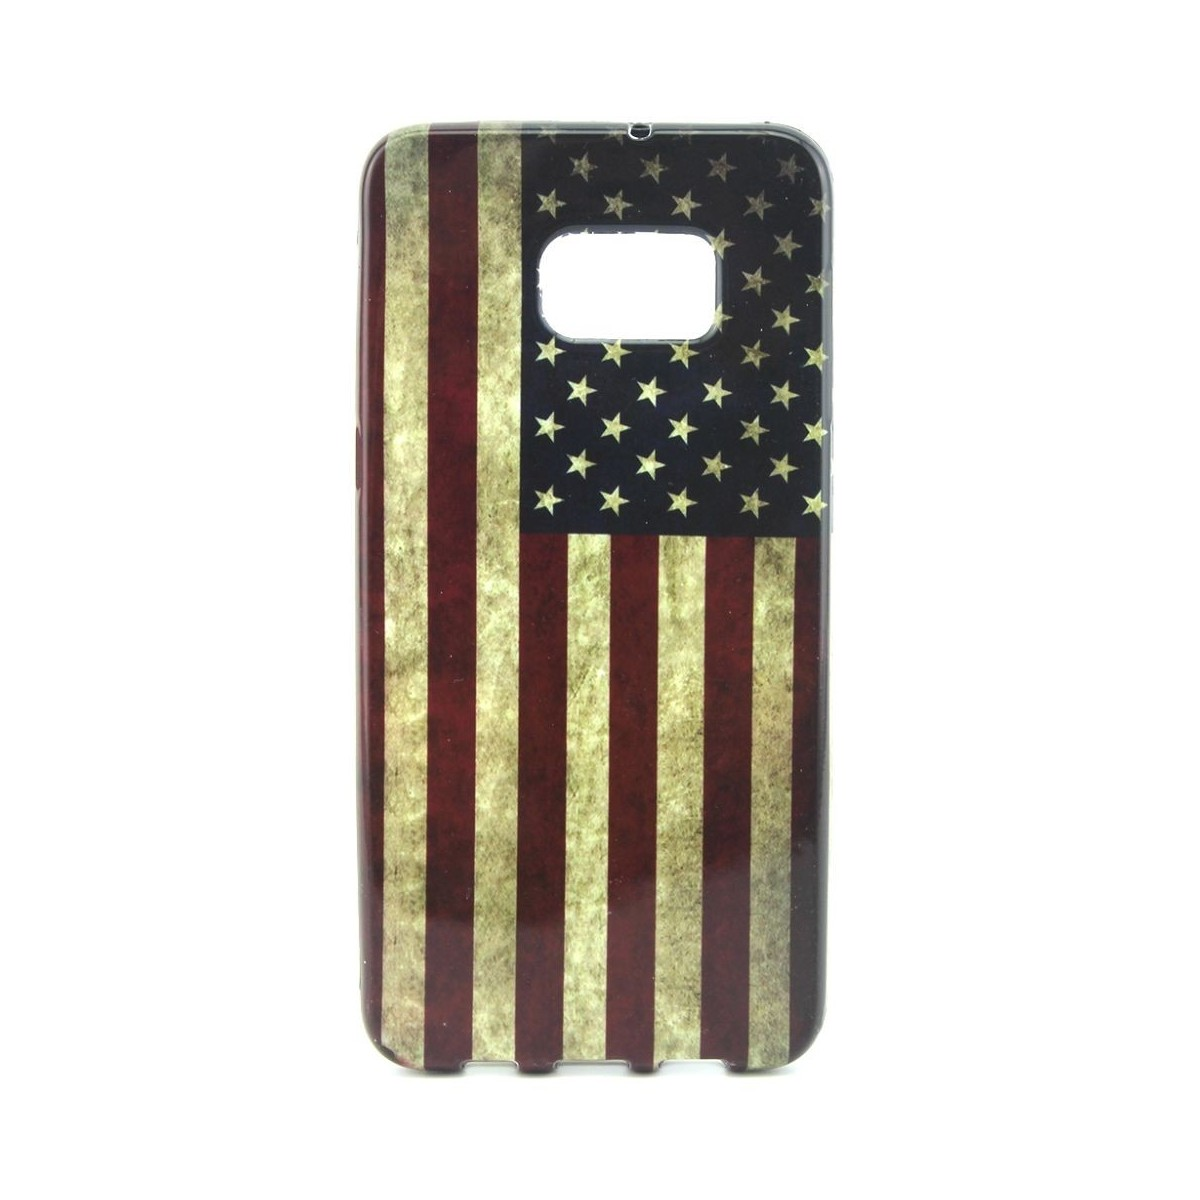 Crazy Kase - Coque Galaxy S6 Edge Plus motif Drapeau USA Vintage